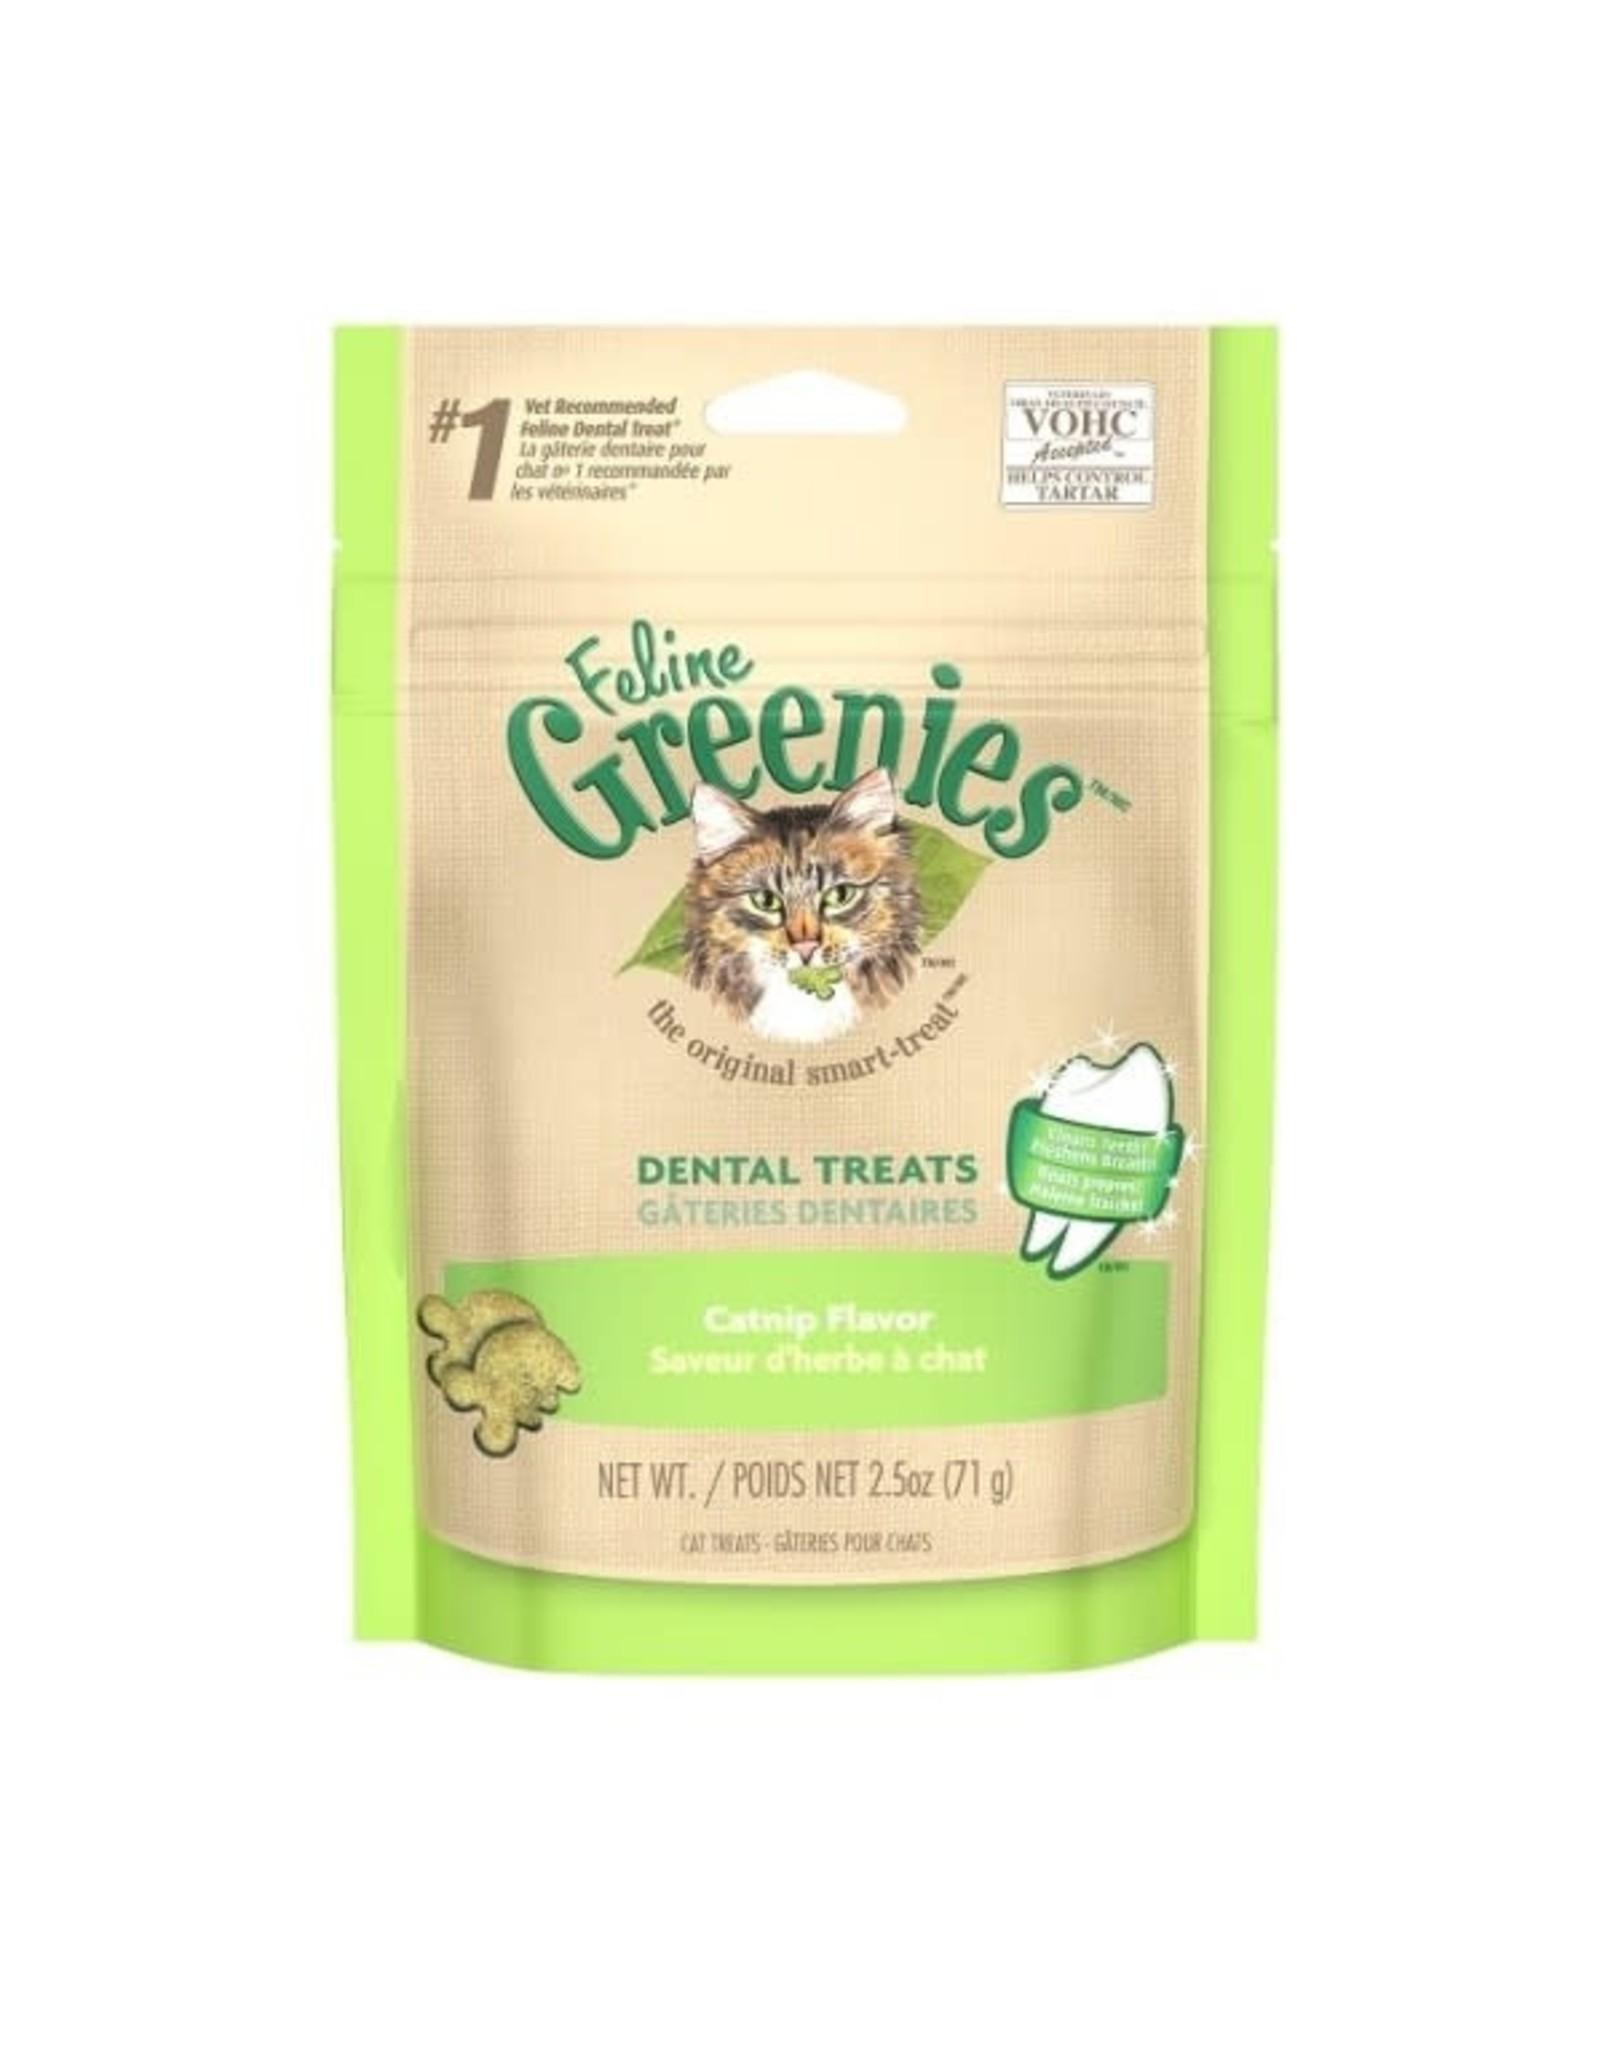 Greenies feline greenies catnip flavor cat